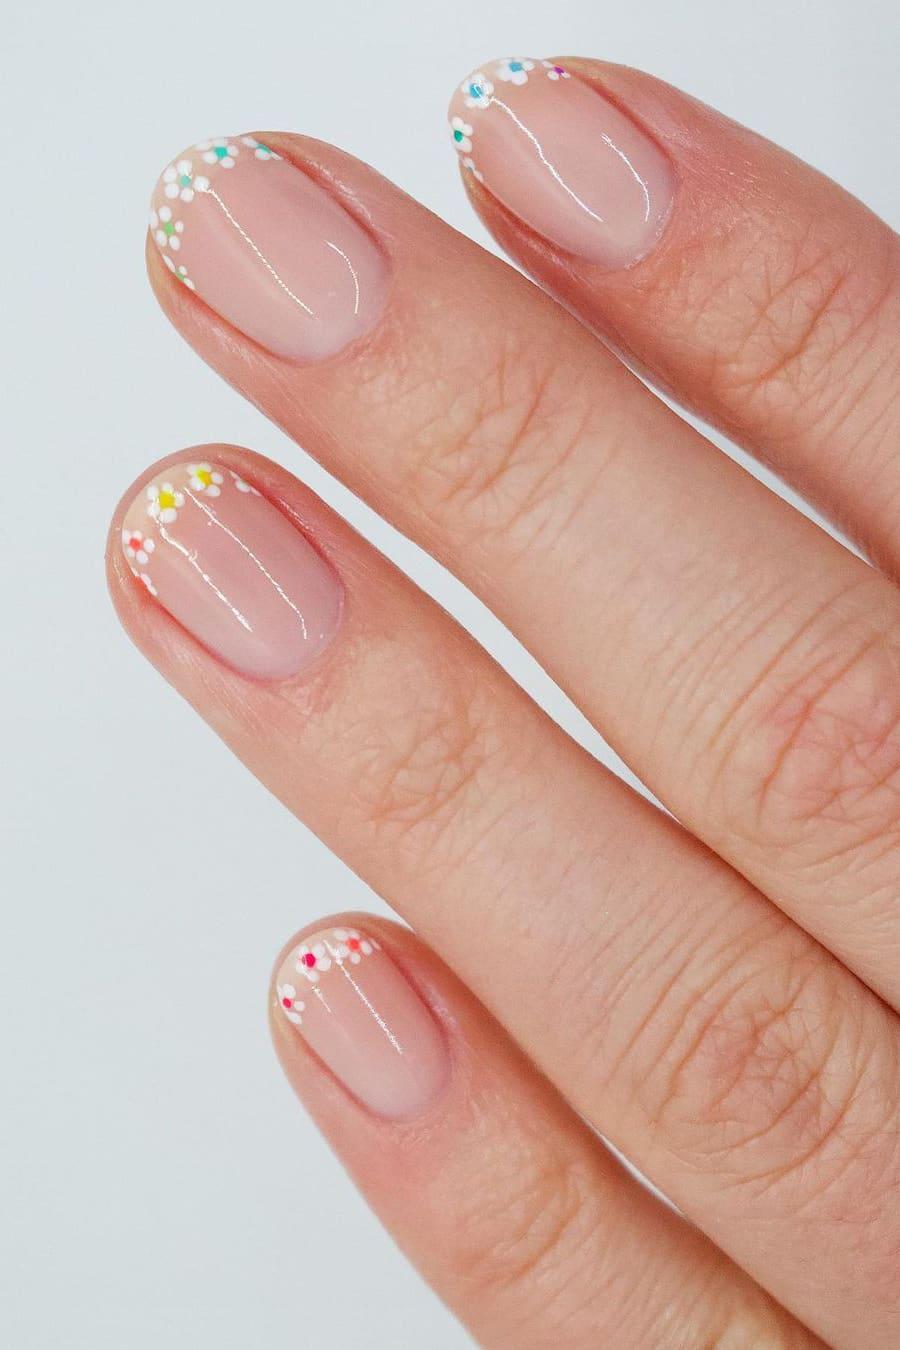 Floral rainbow nails